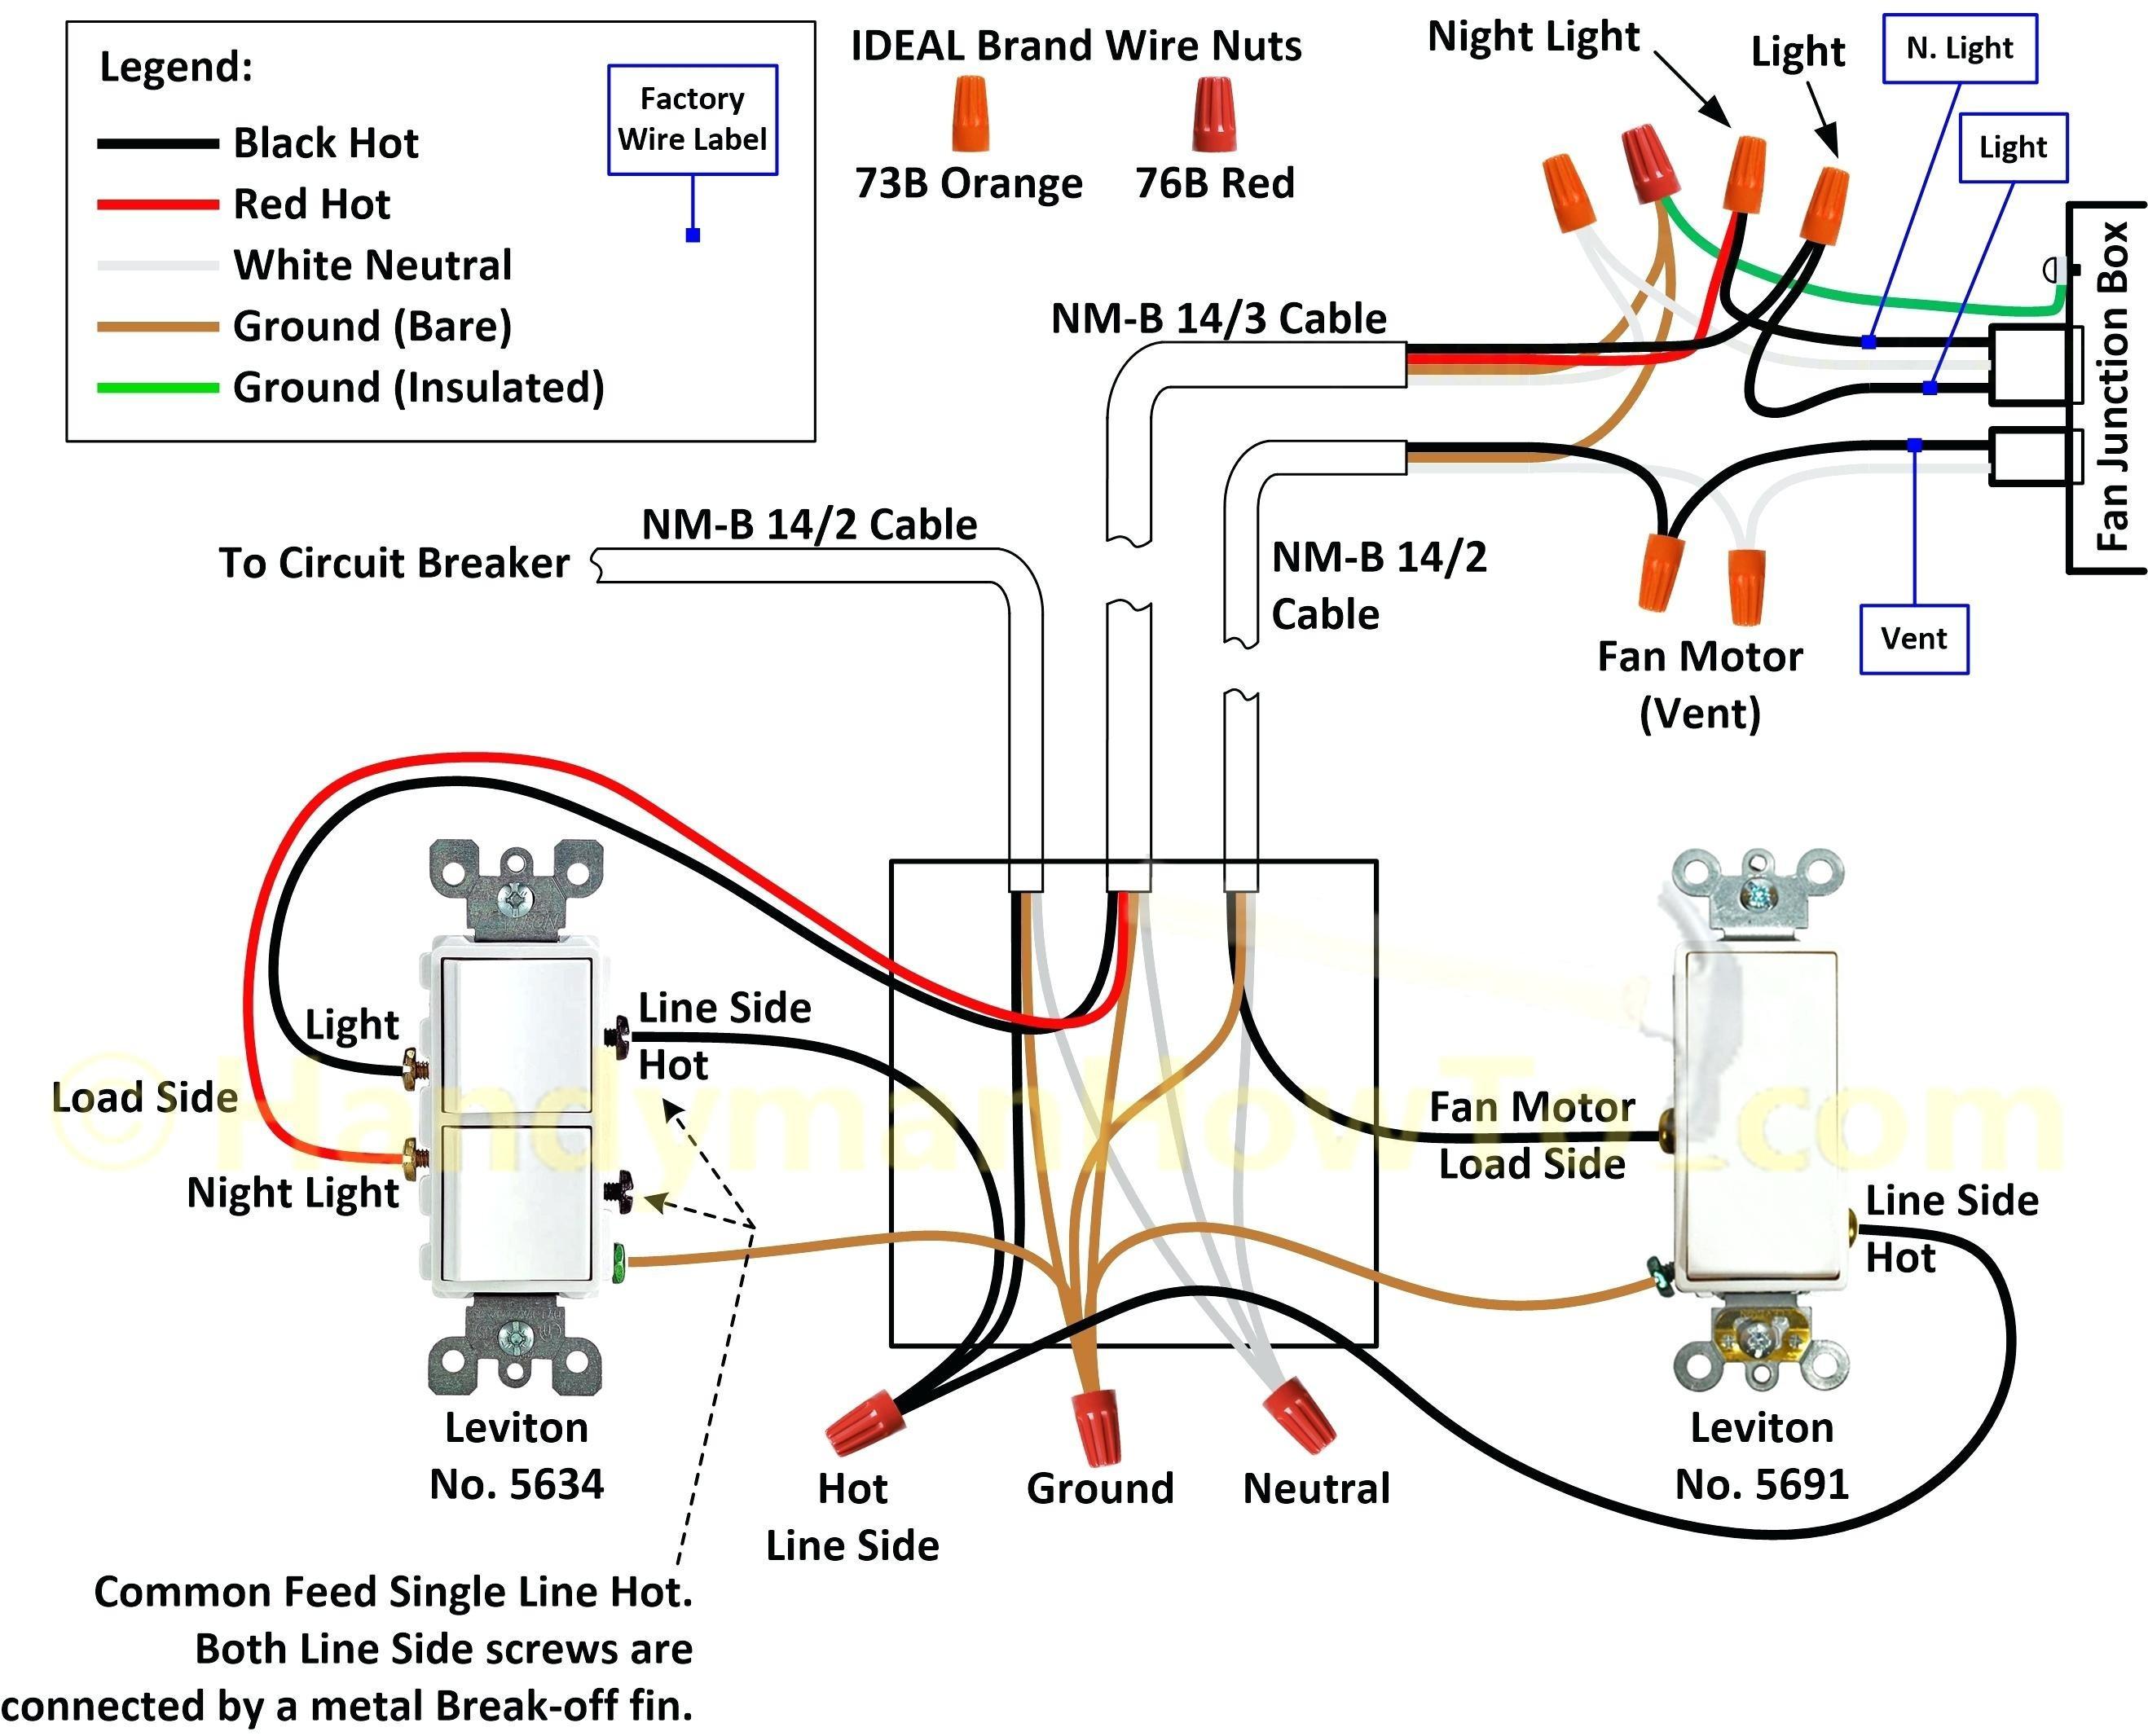 telecaster 3 way switch wiring diagram variations wiring diagrams rh 14 dfg hartmannphoto de